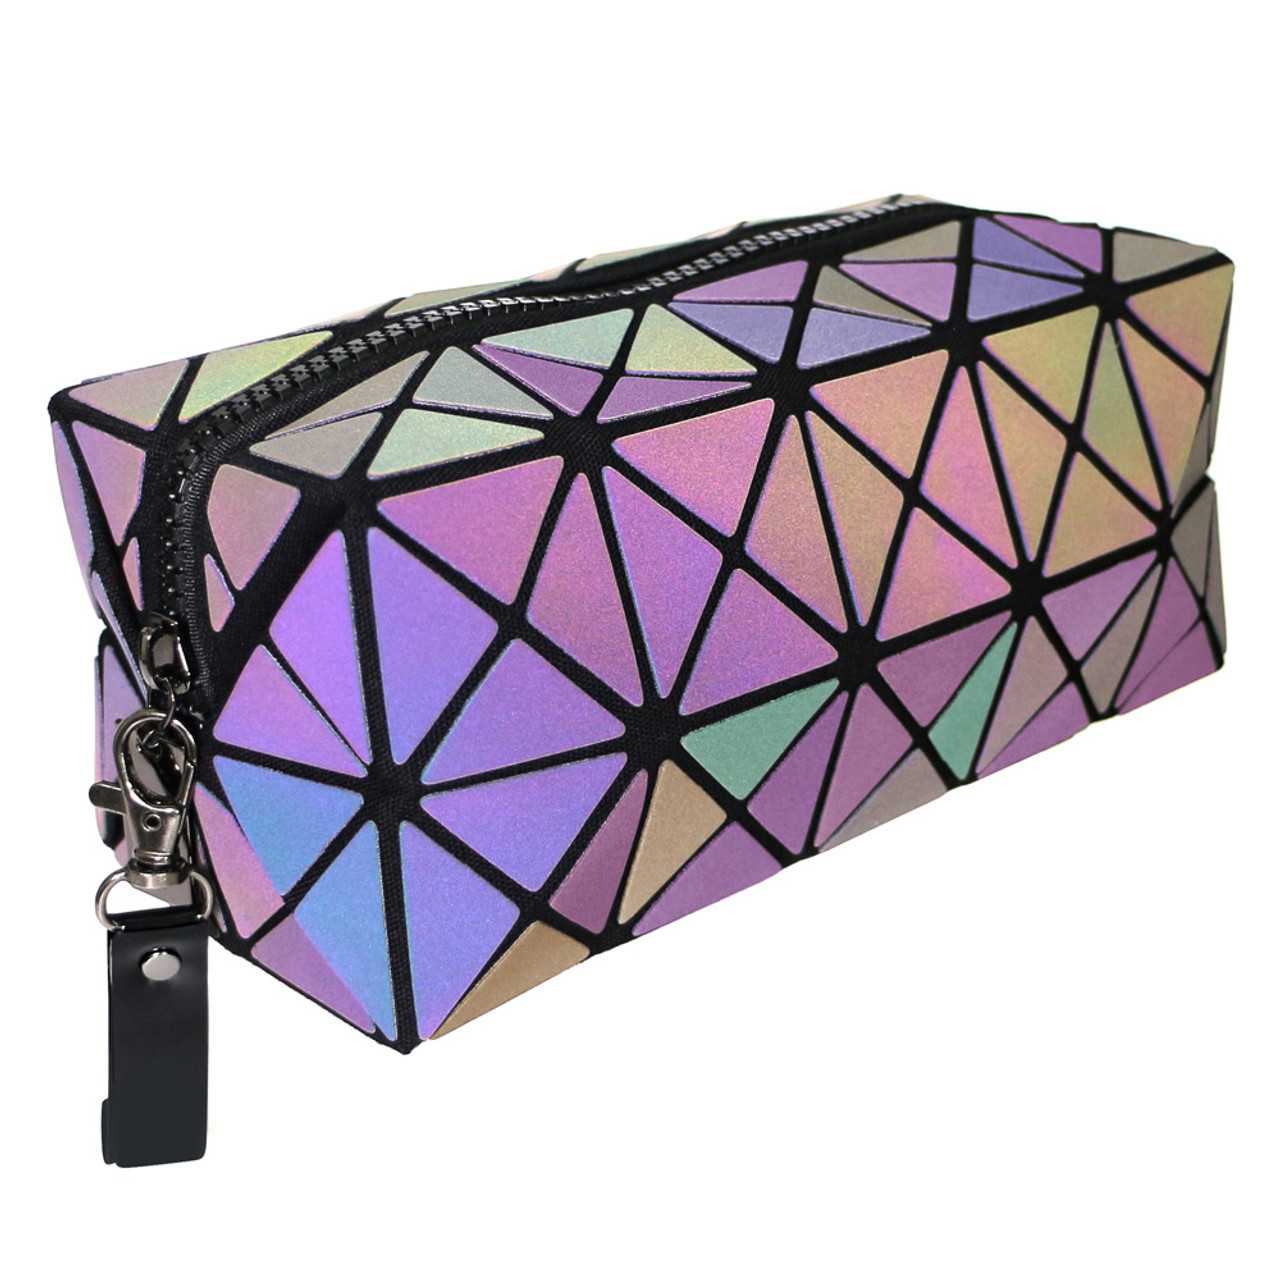 Color Change Rainbow Geometric Lattice Fold Makeup Bag ( 45 Degree Angel View & Light Reflective Mode )